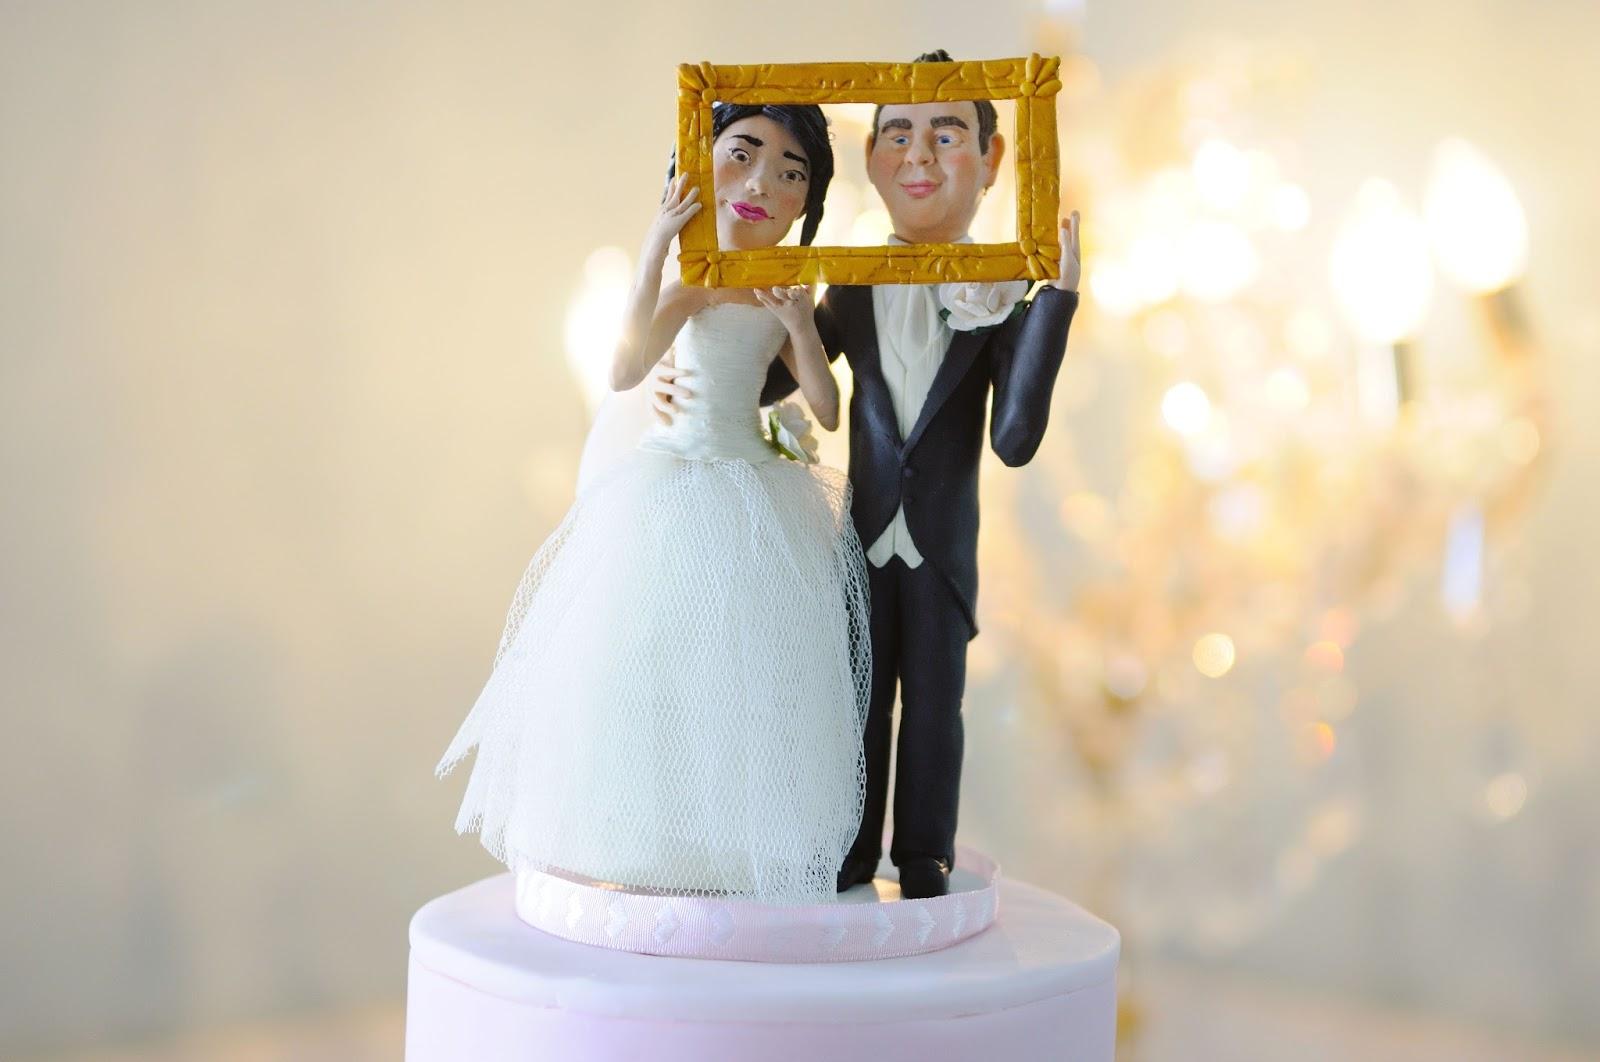 wedding cake topper figurines